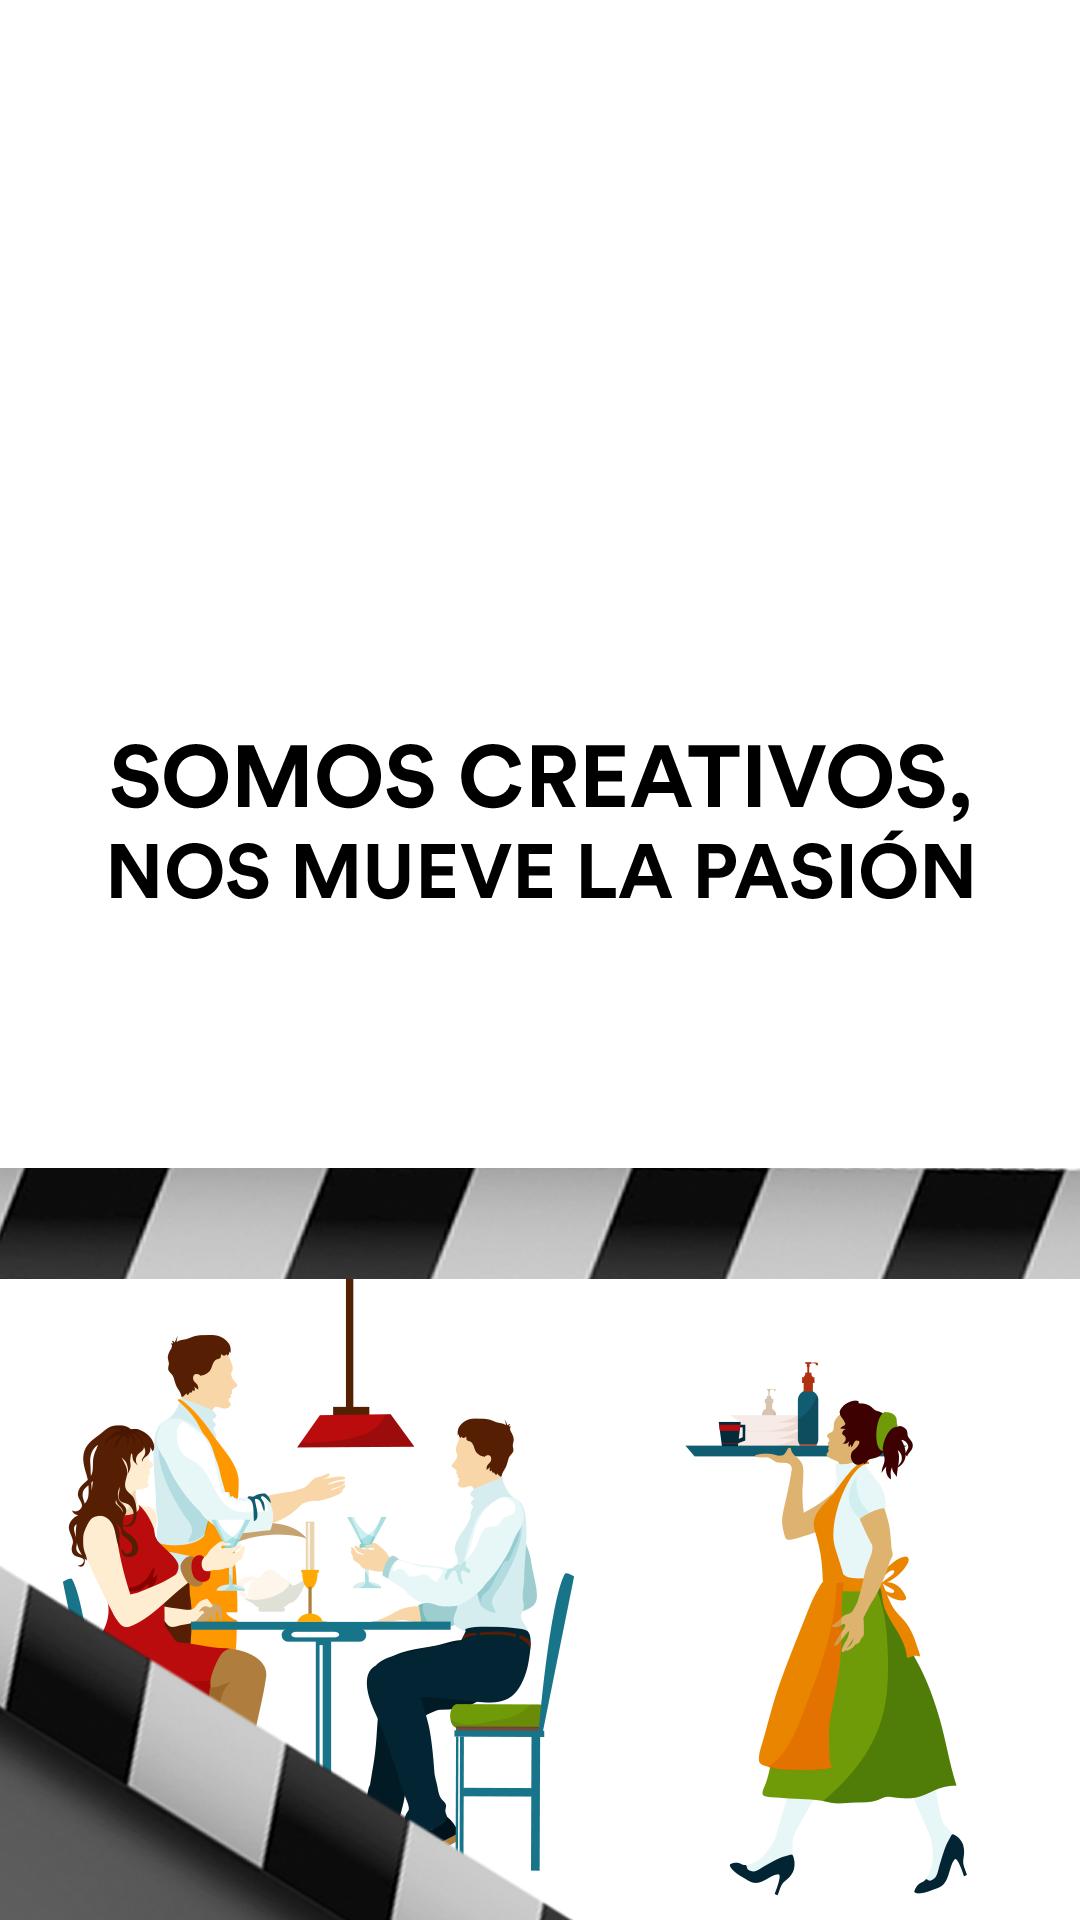 clikaudiovisual